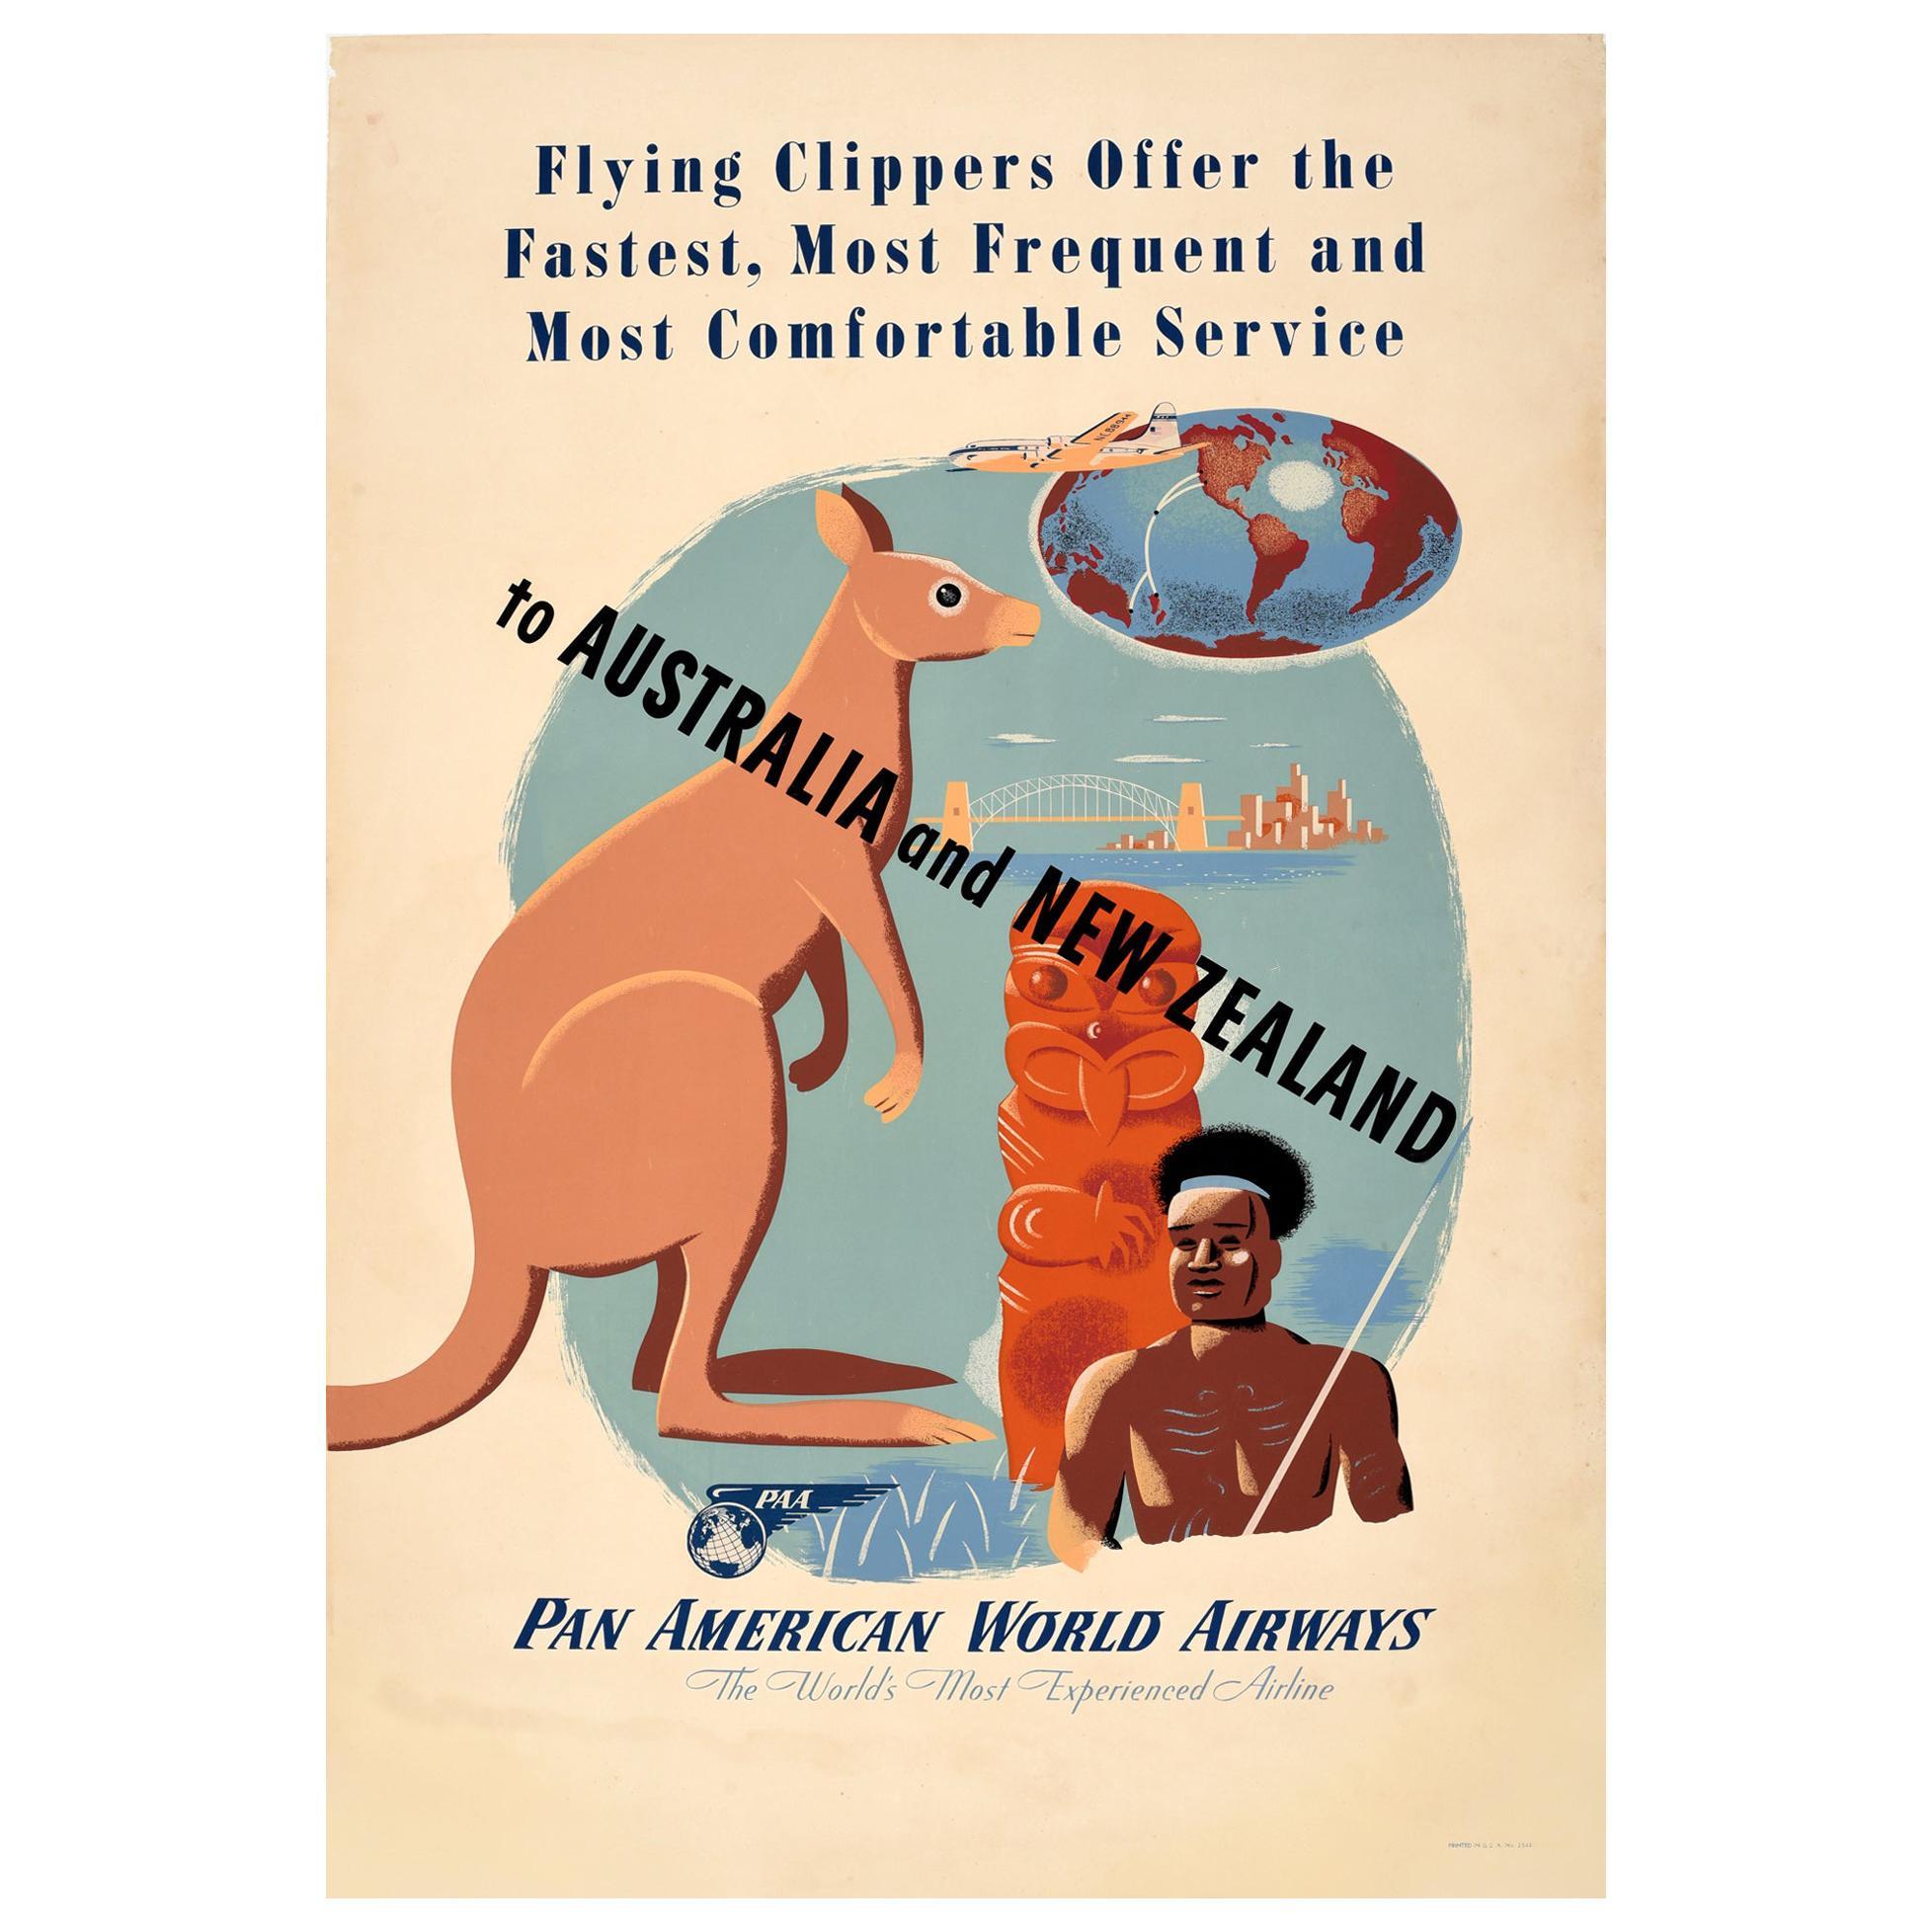 Original Vintage Pan Am Travel Poster To Australia And New Zealand Pan American